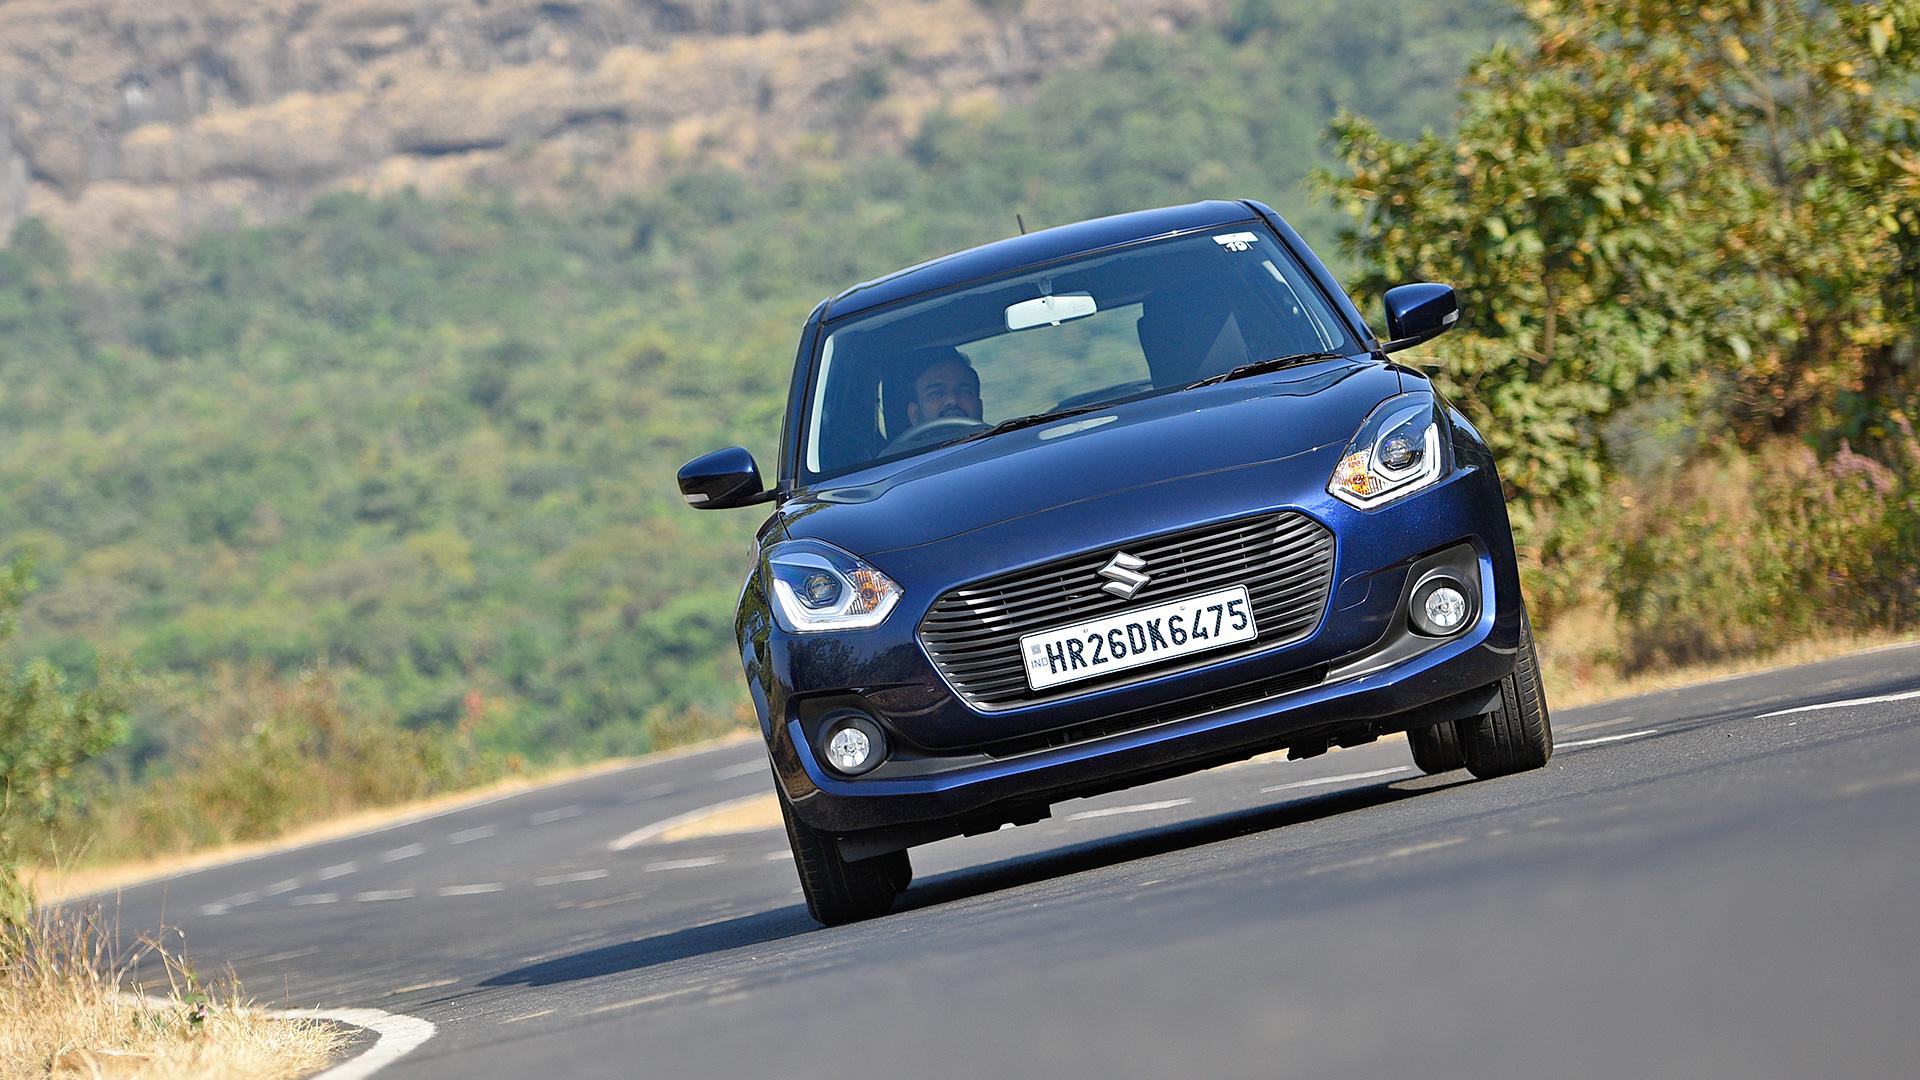 Maruti Suzuki Swift 2018 Vxi Price Mileage Reviews